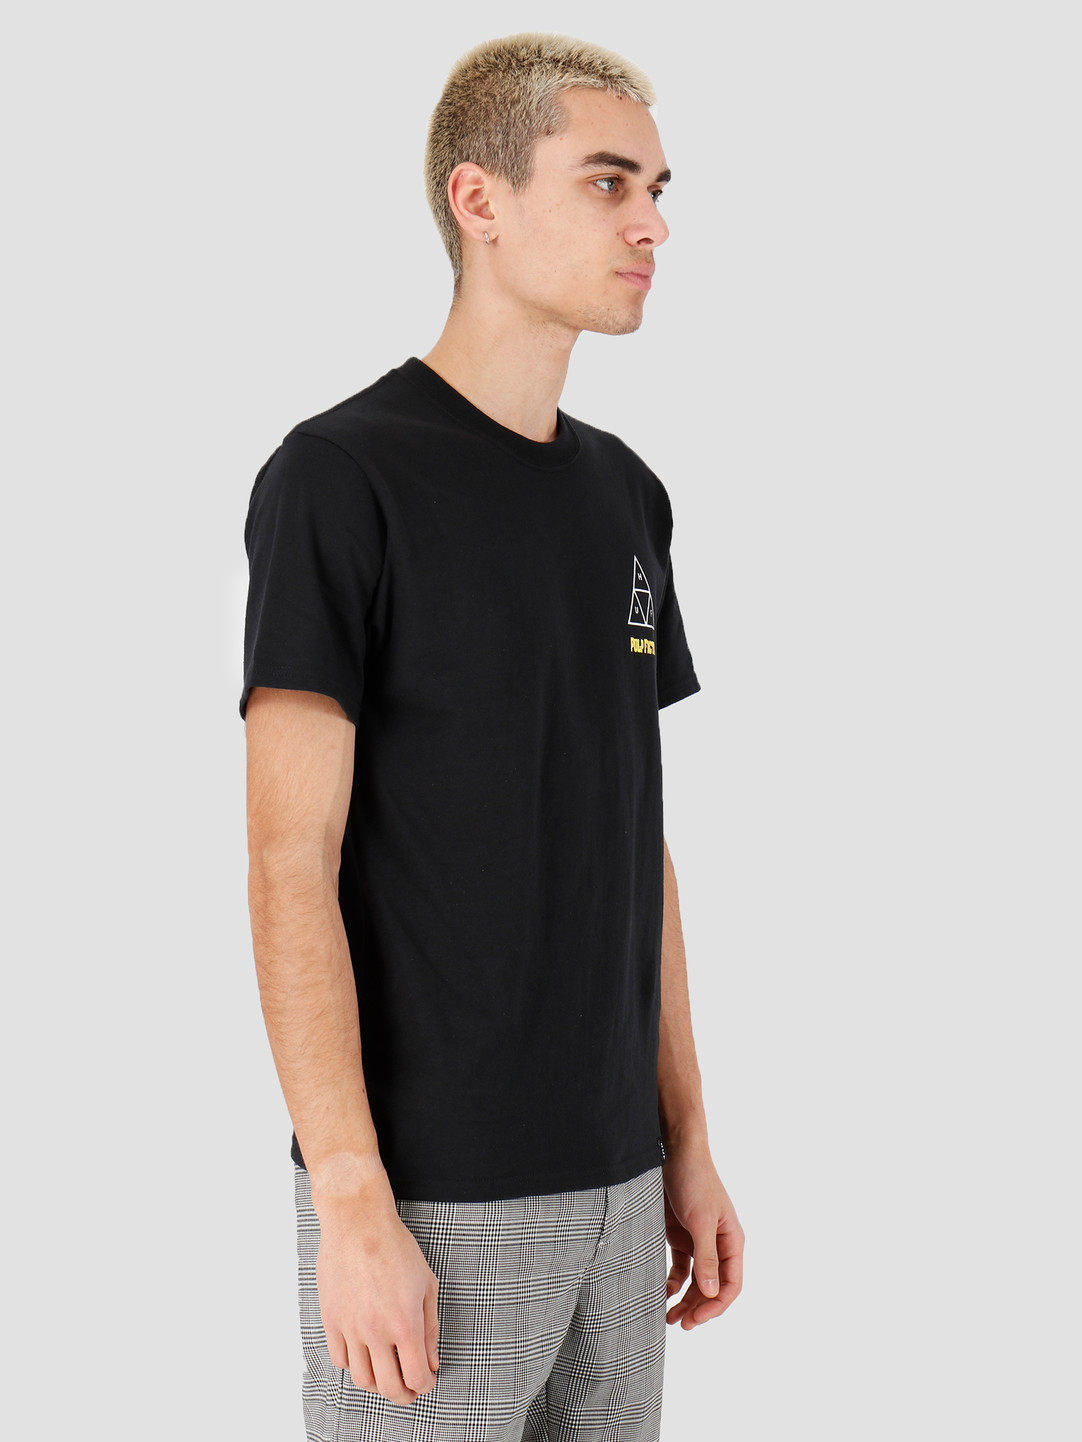 HUF HUF Mia Tt Short Sleeve Tee Black TS01315